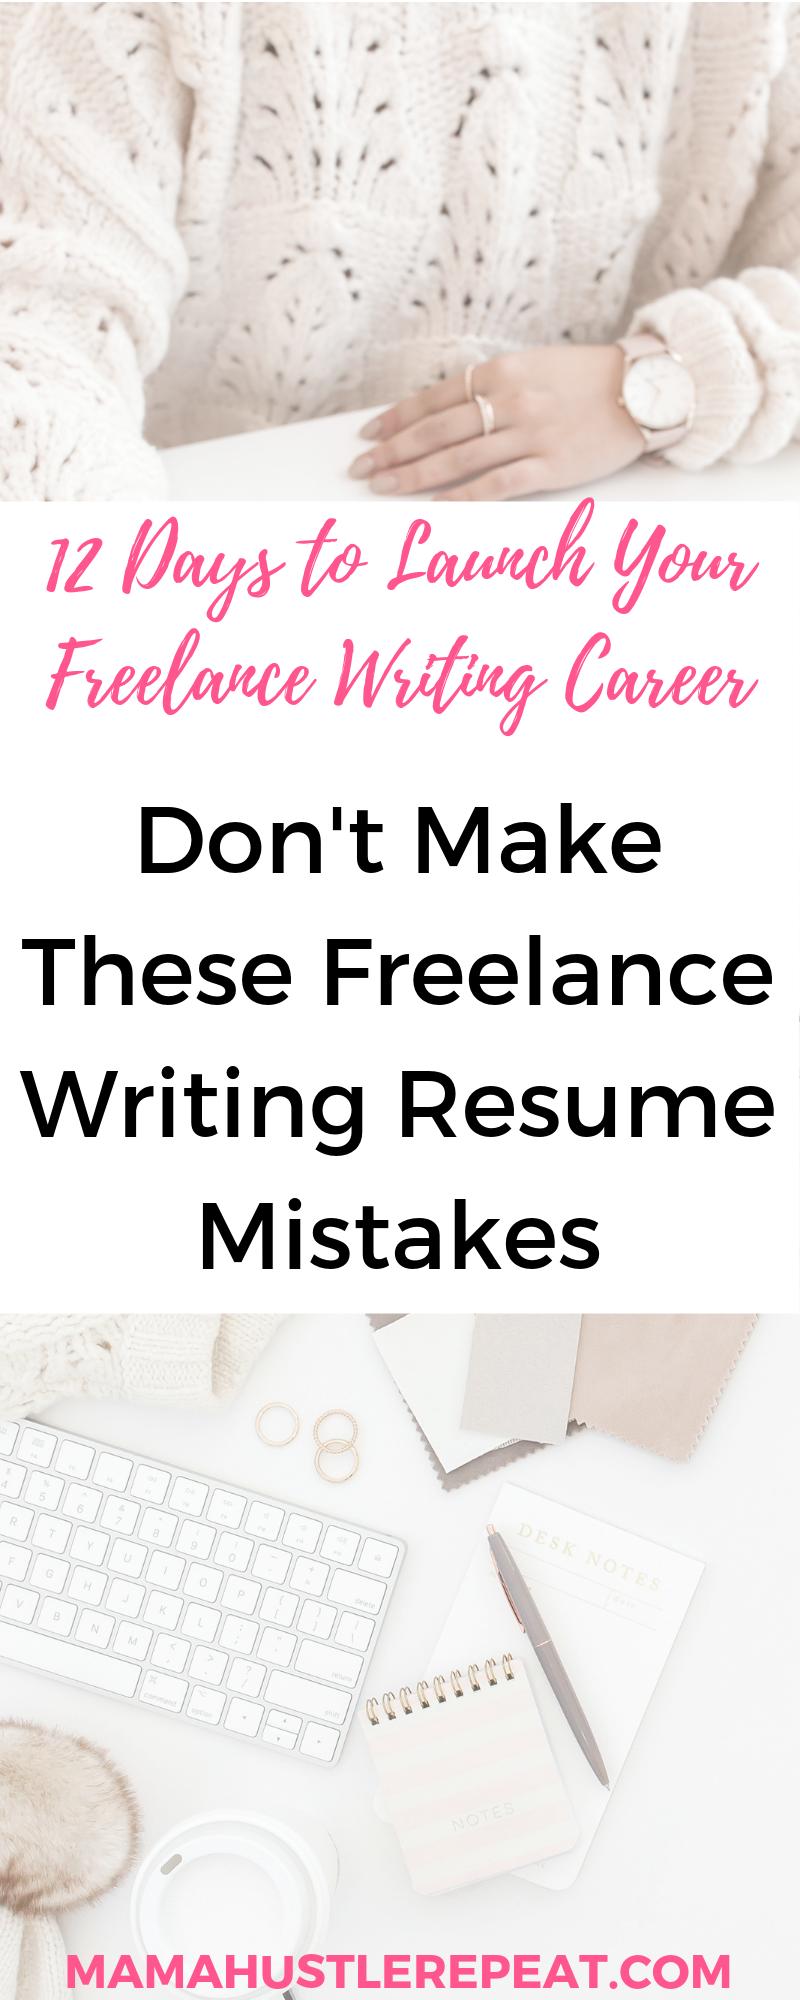 5 Freelance Writer Resume Mistakes to Avoid Online